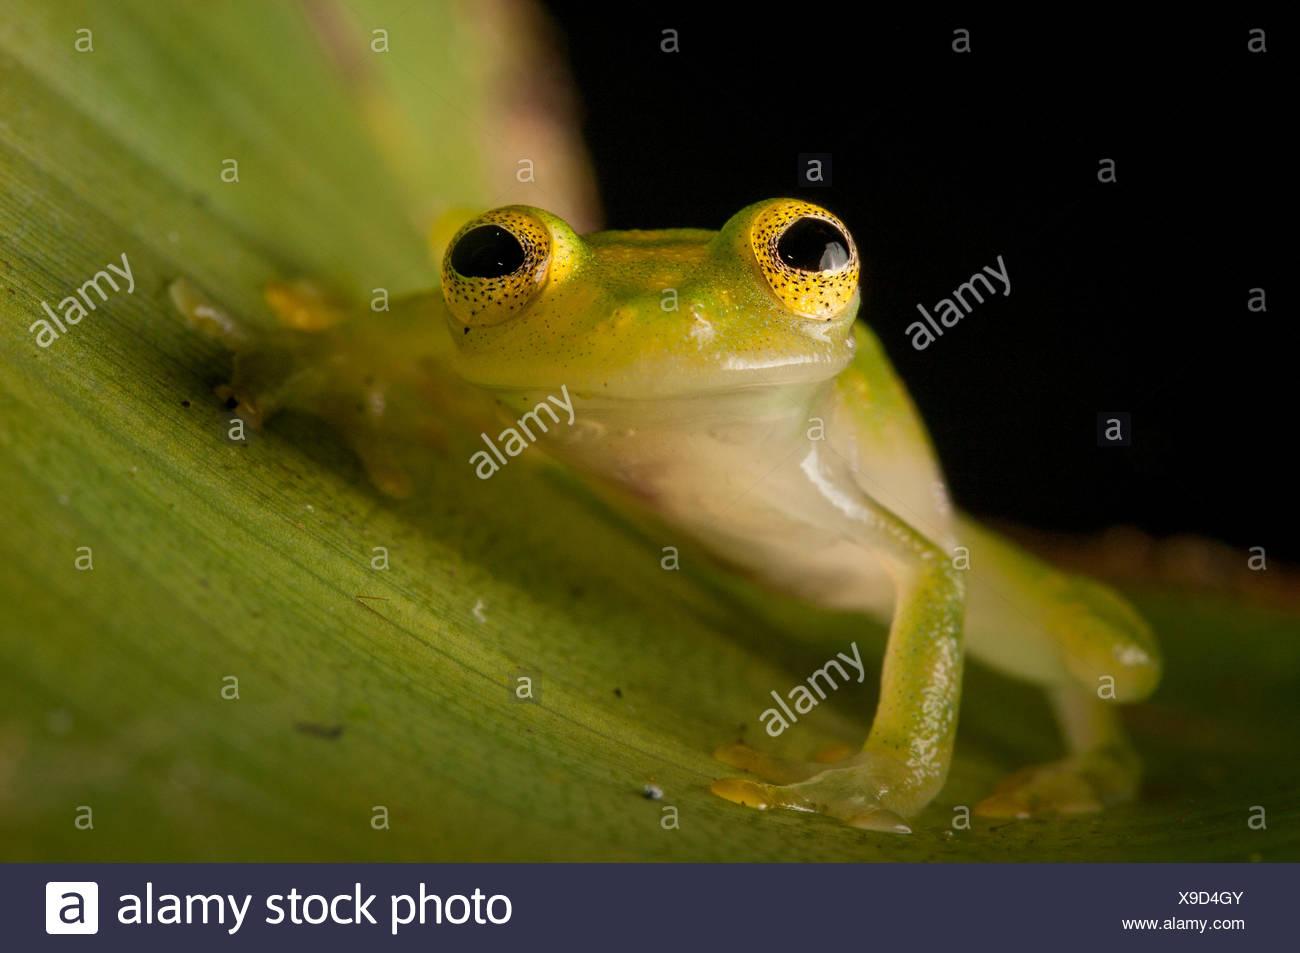 Portrait of a cricket glass frog, Hyalinobatrachium colymbiphyllum. - Stock Image